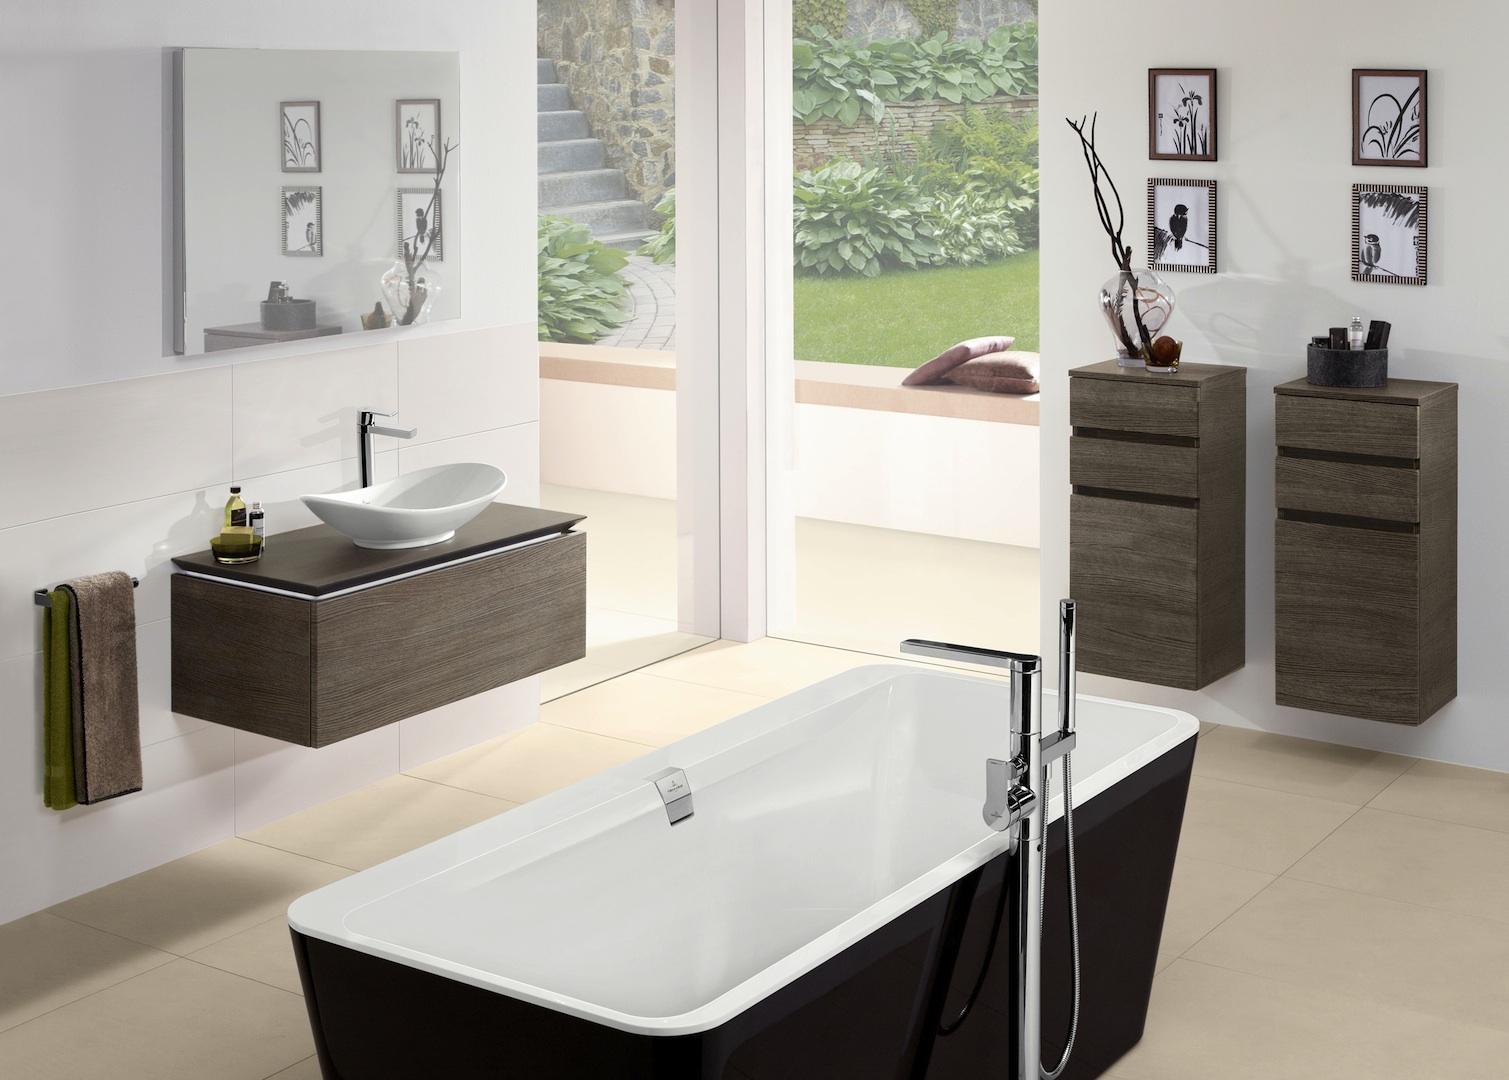 Badkamermeubels en bad Legato van Villeroy & Boch